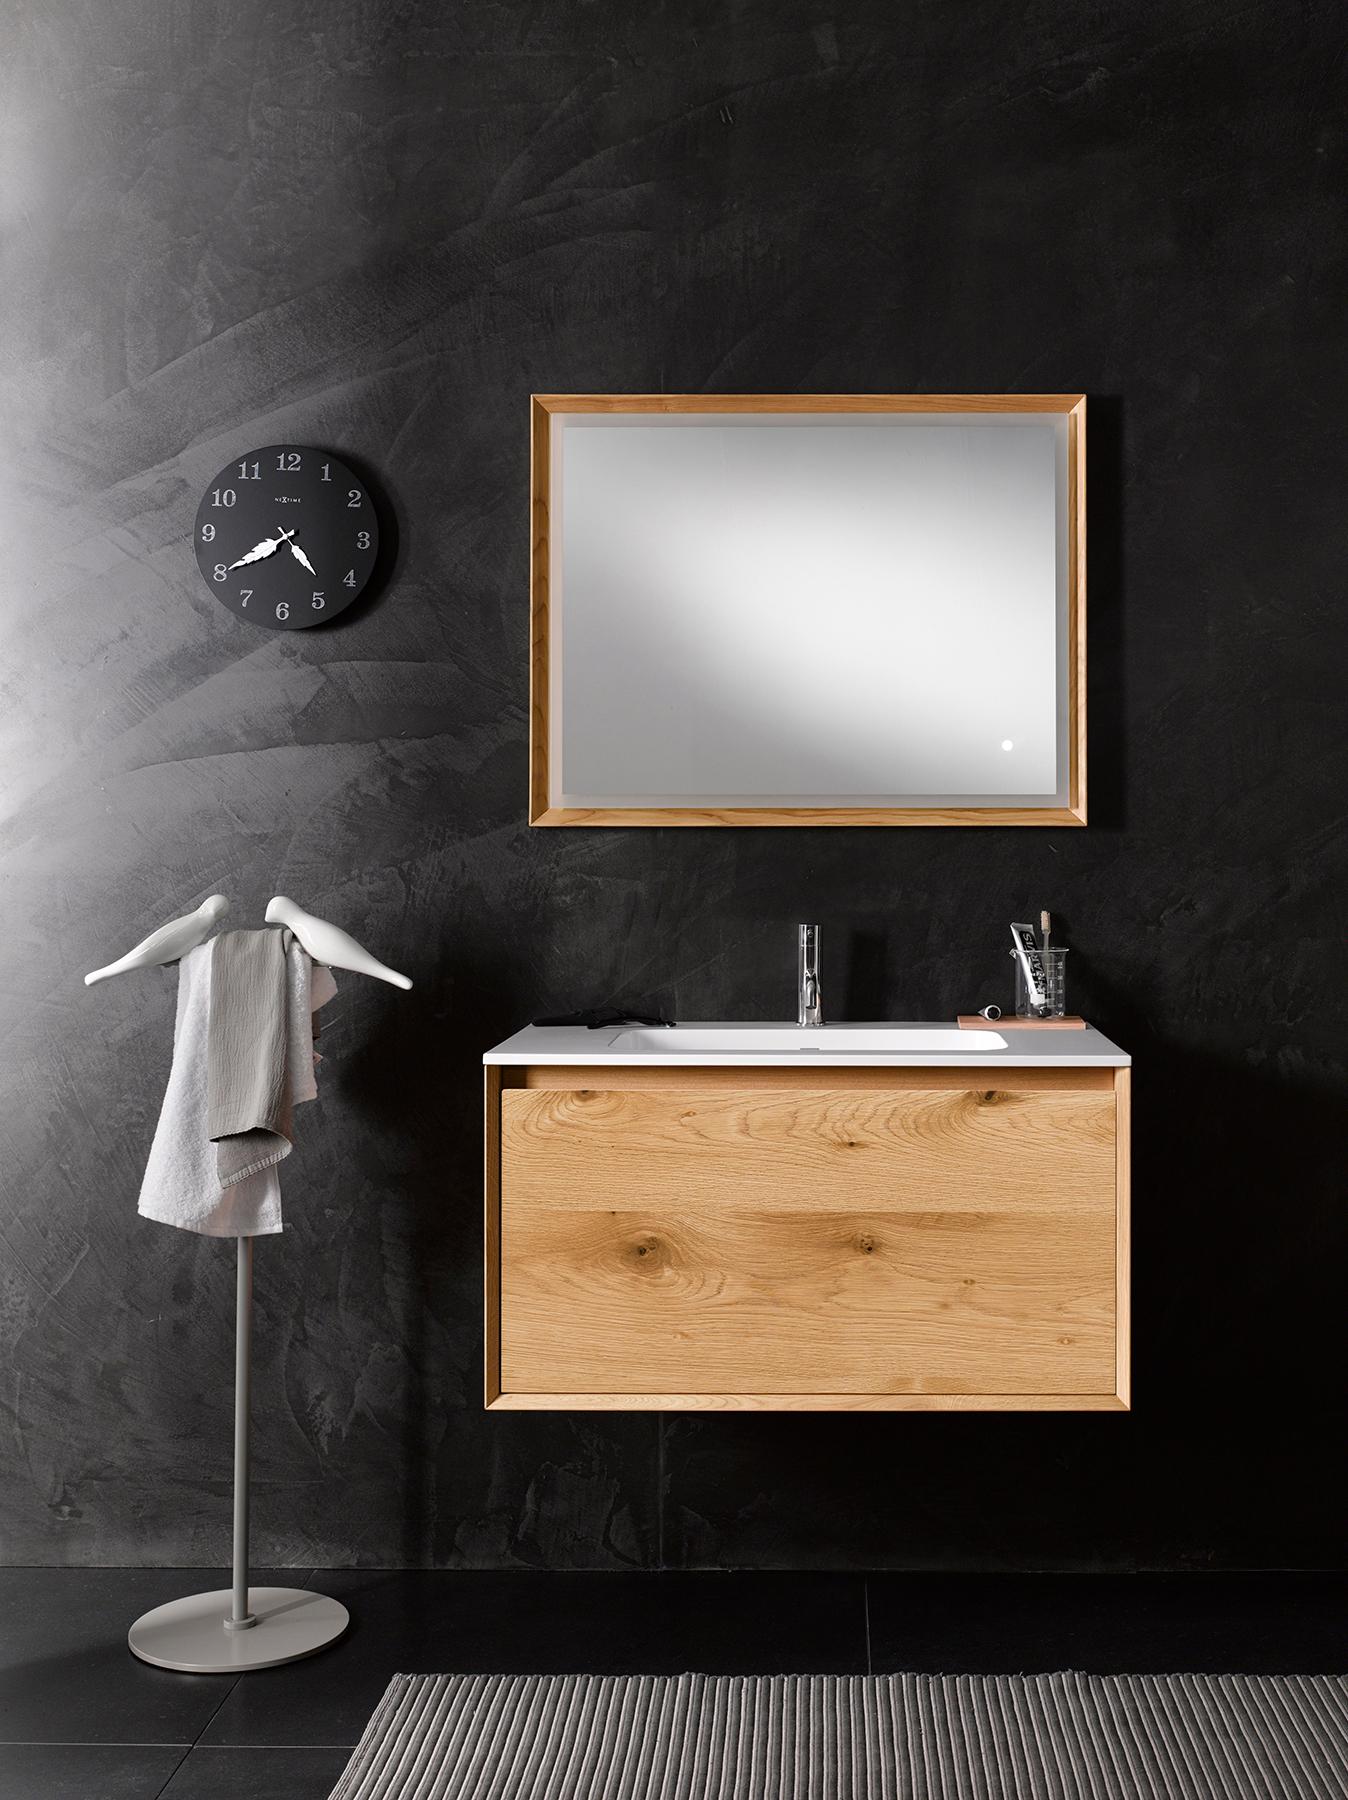 Modern 45 Degree Full Wall Mount Vanity Series 900